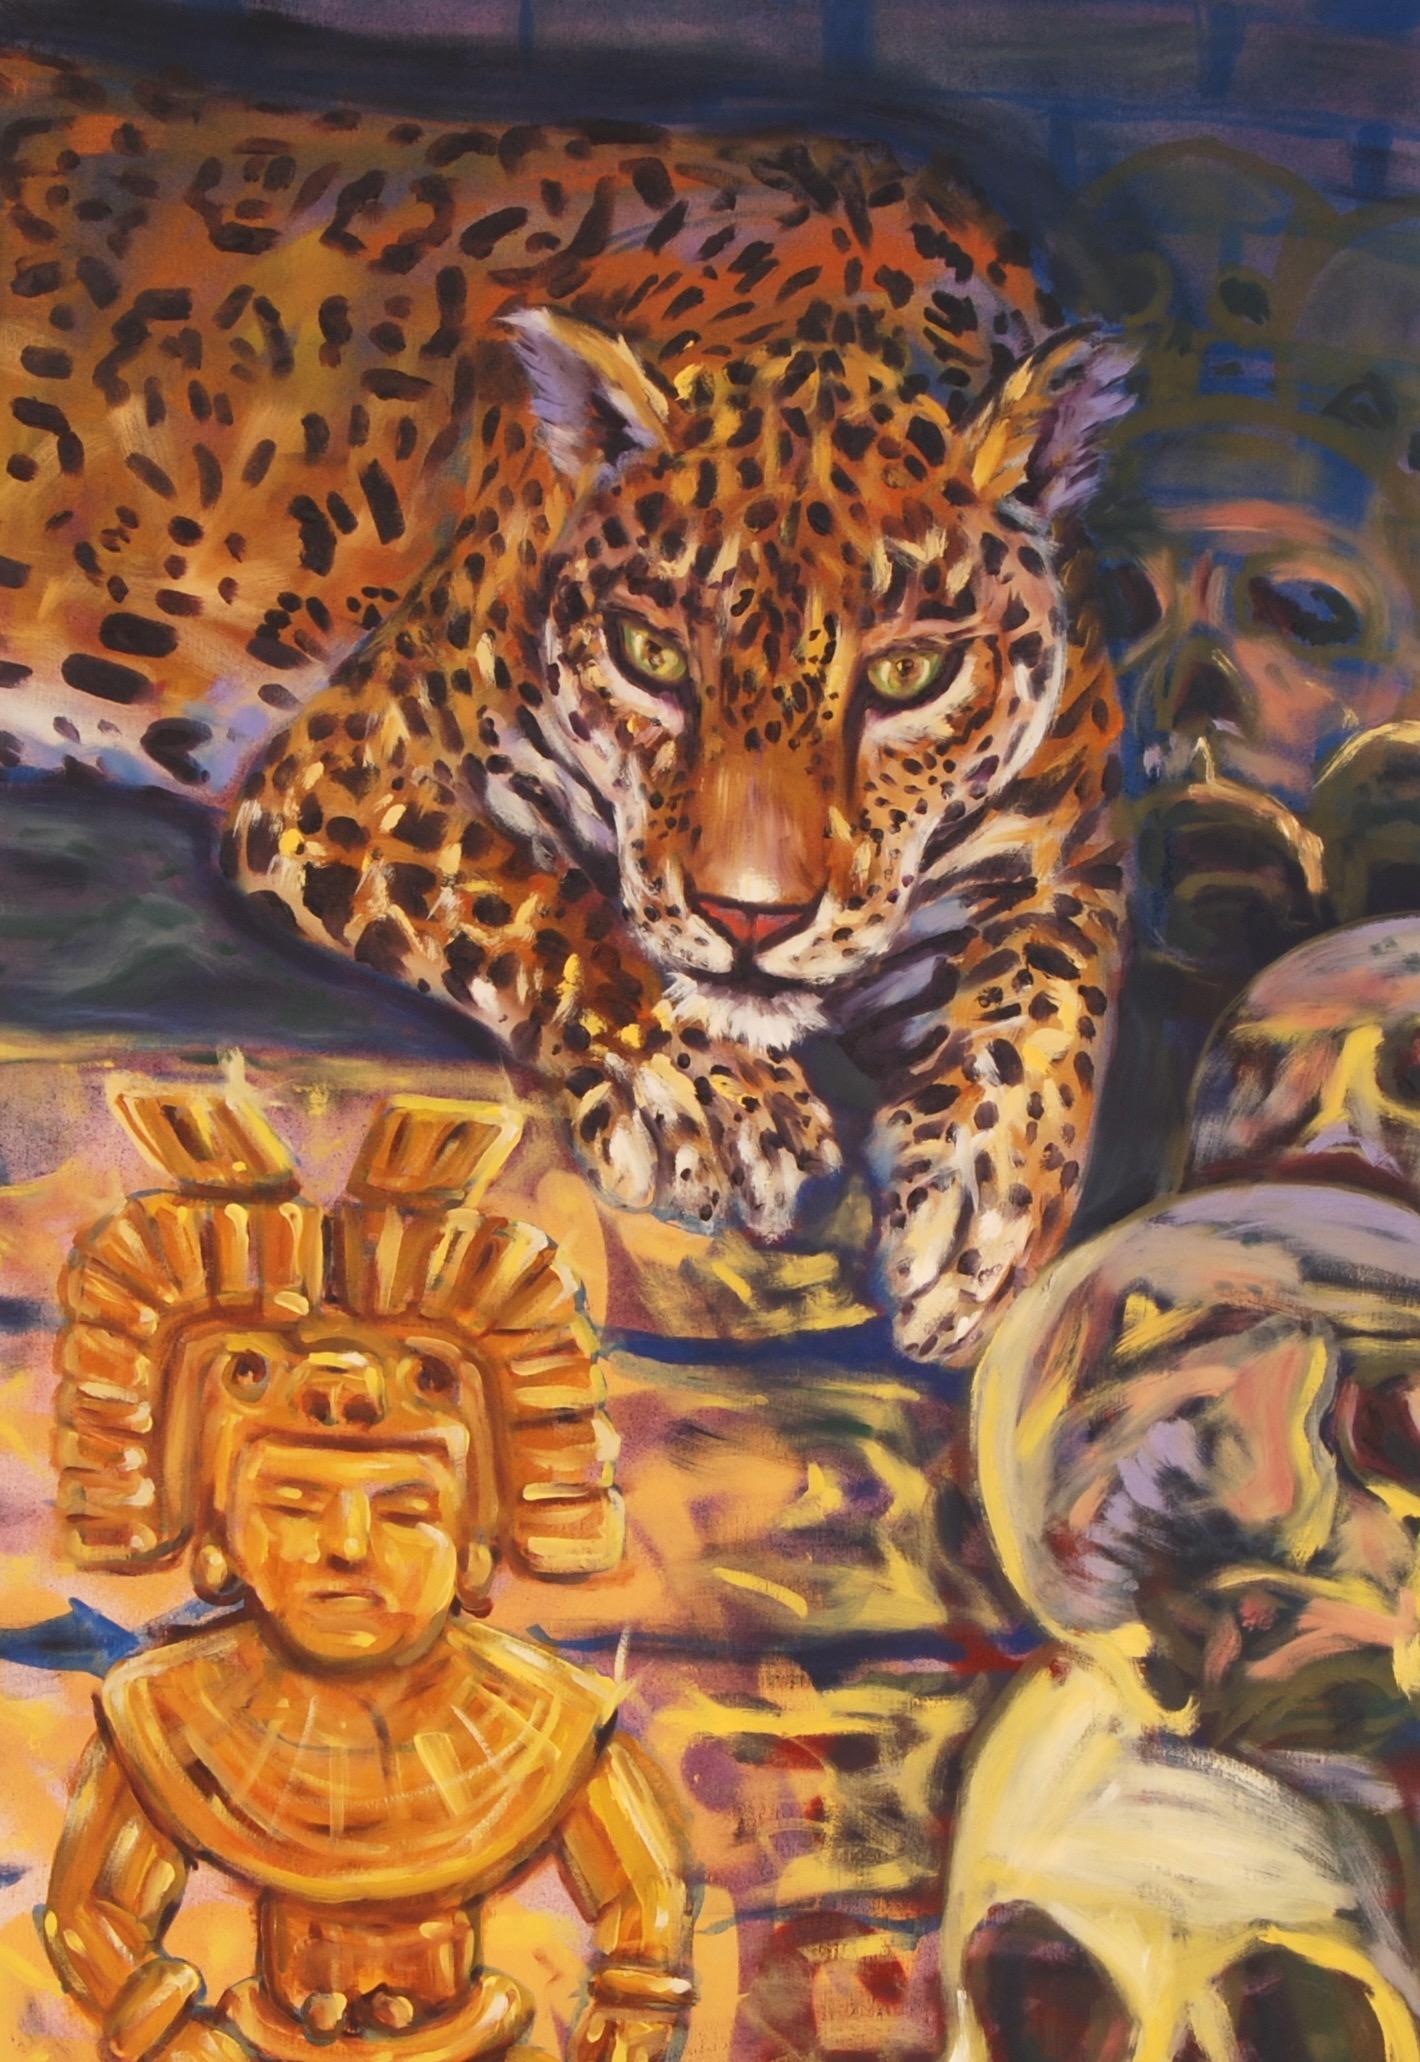 The Old Jaguar Gazed Greedily